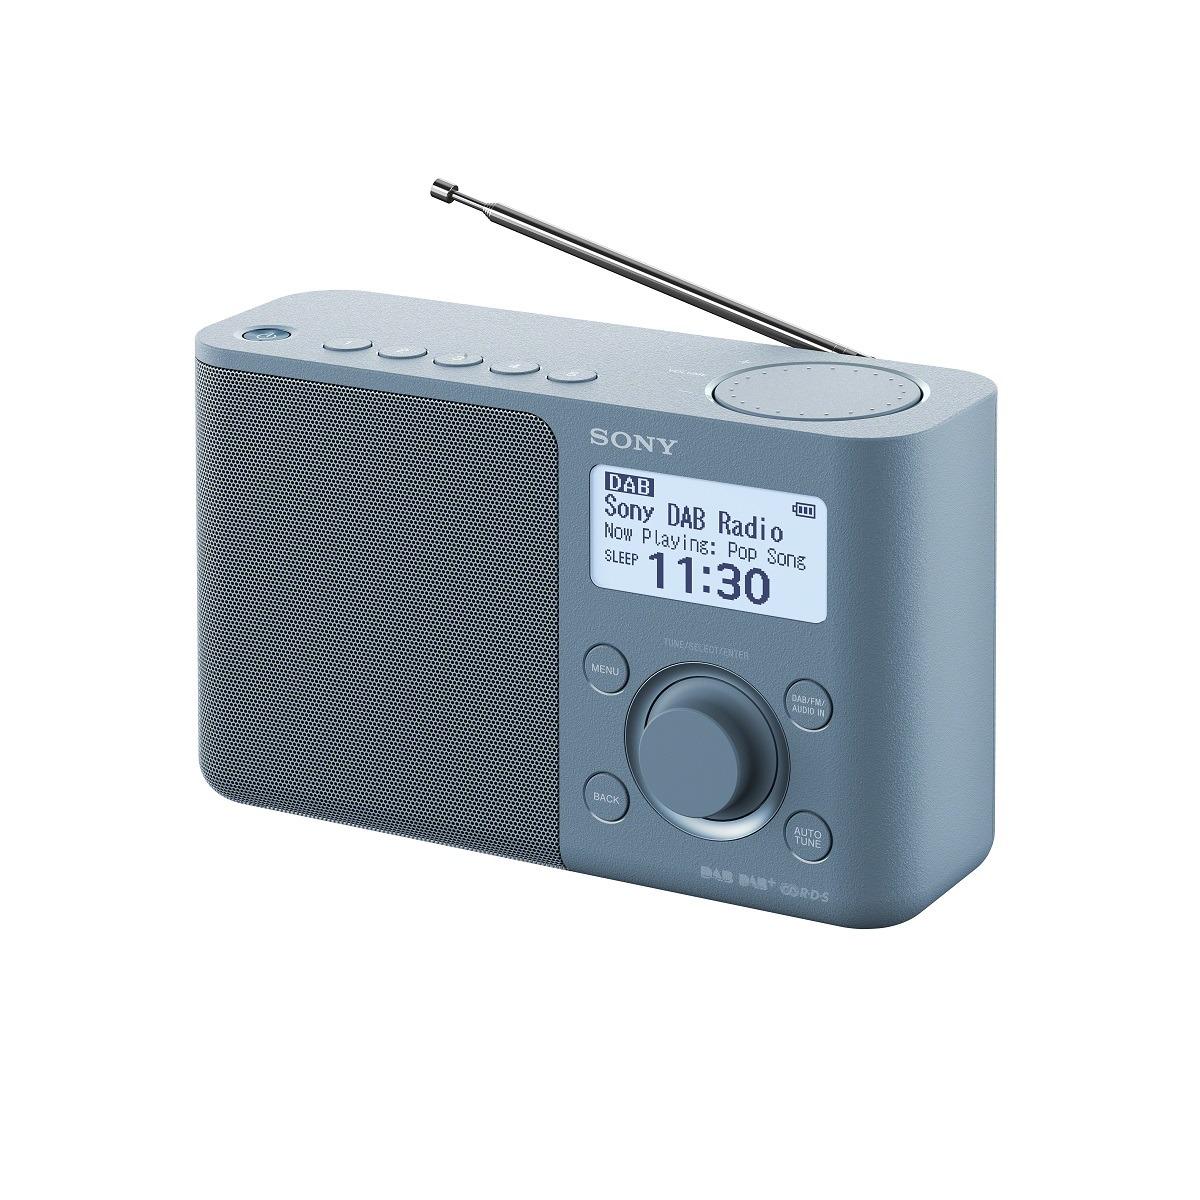 Sony XDR-S61D DAB radio Blauw